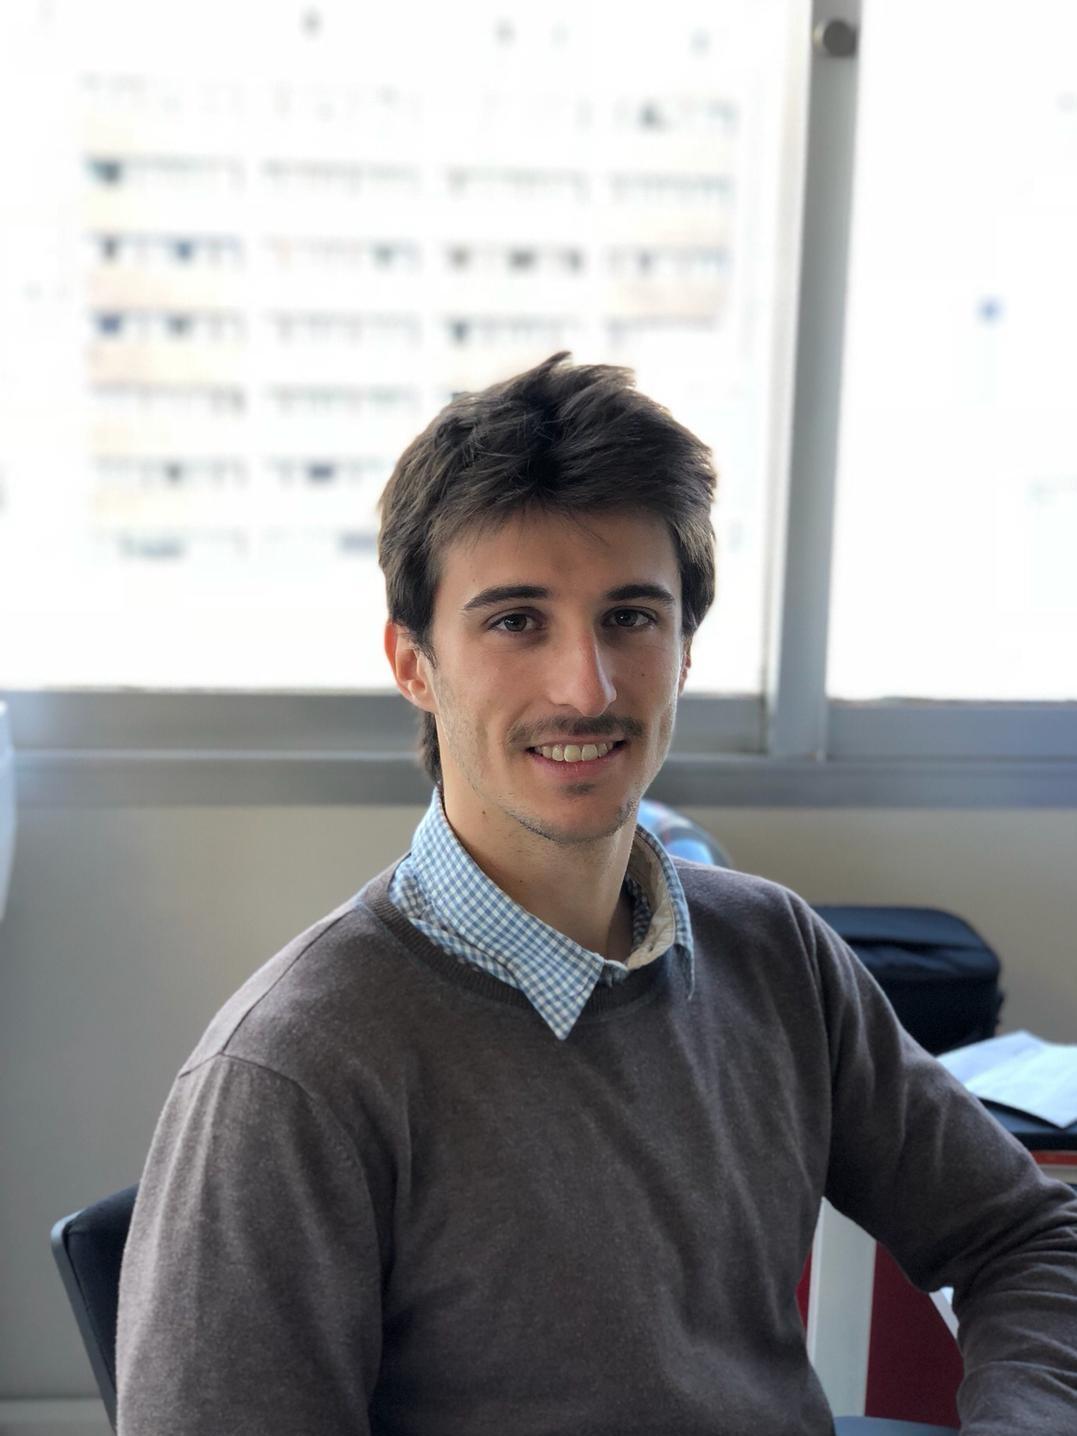 Lluis Llorens Gonzalez - CEO & Co-fundadorLinkedin | Twitter